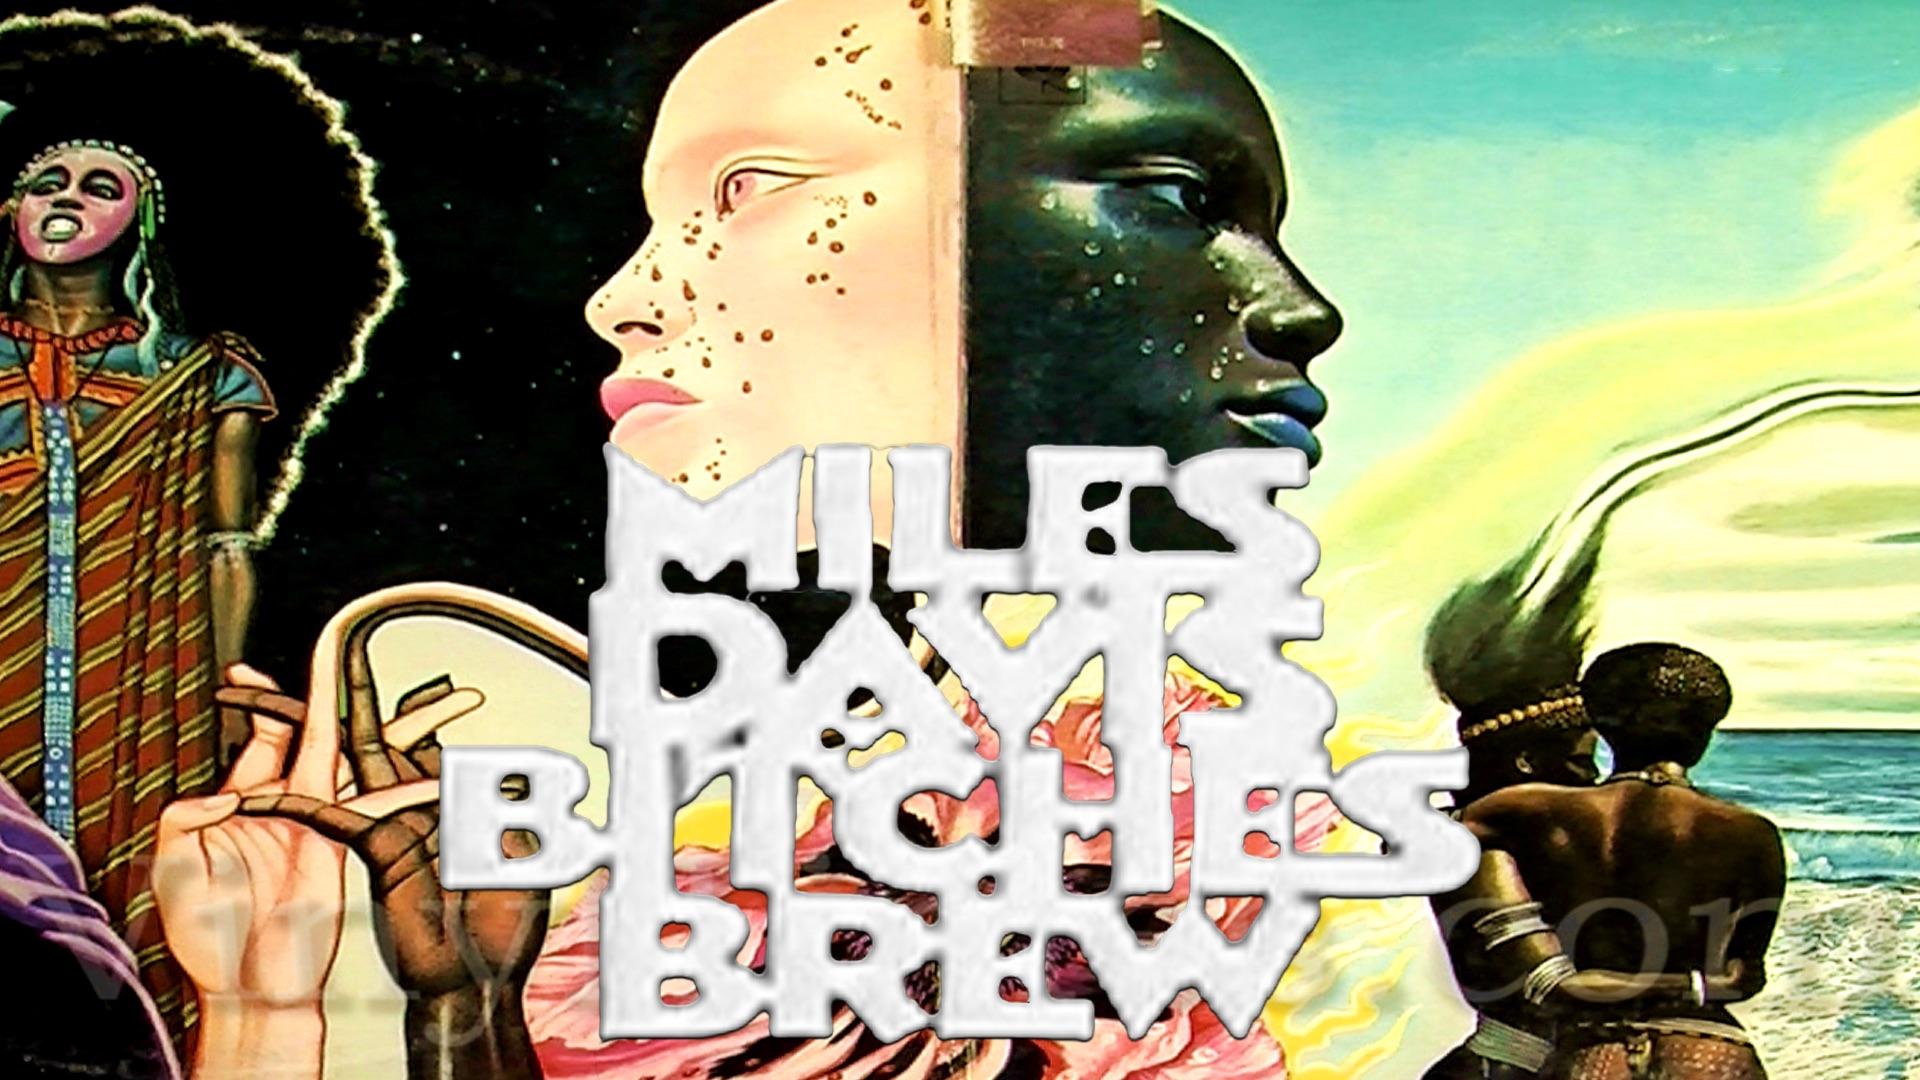 Bitches Brew